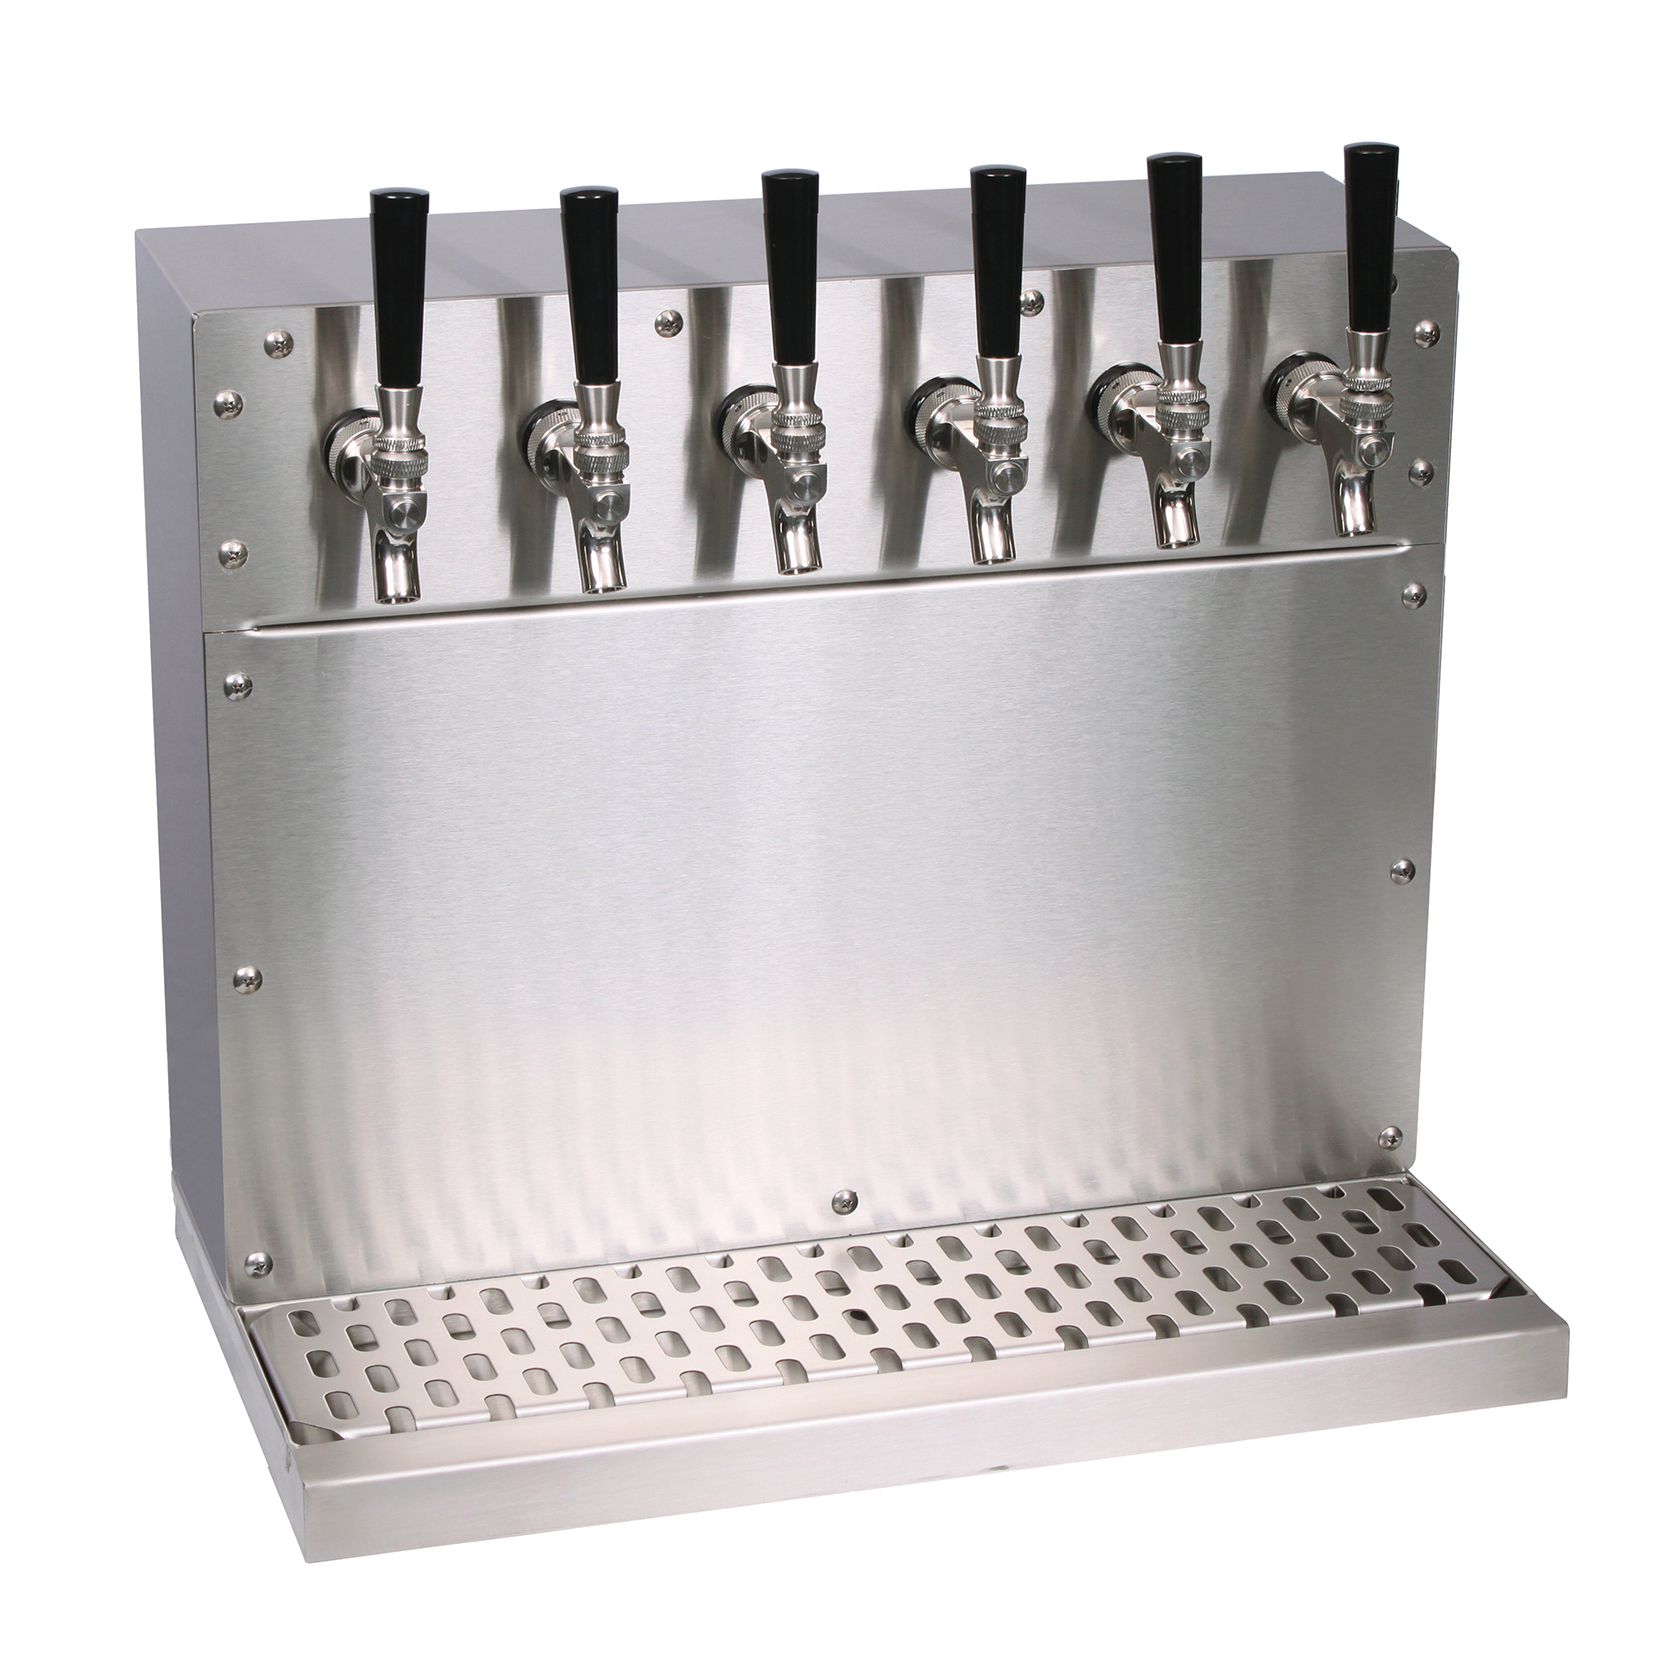 Glastender WT-5-SSR draft beer / wine dispensing tower